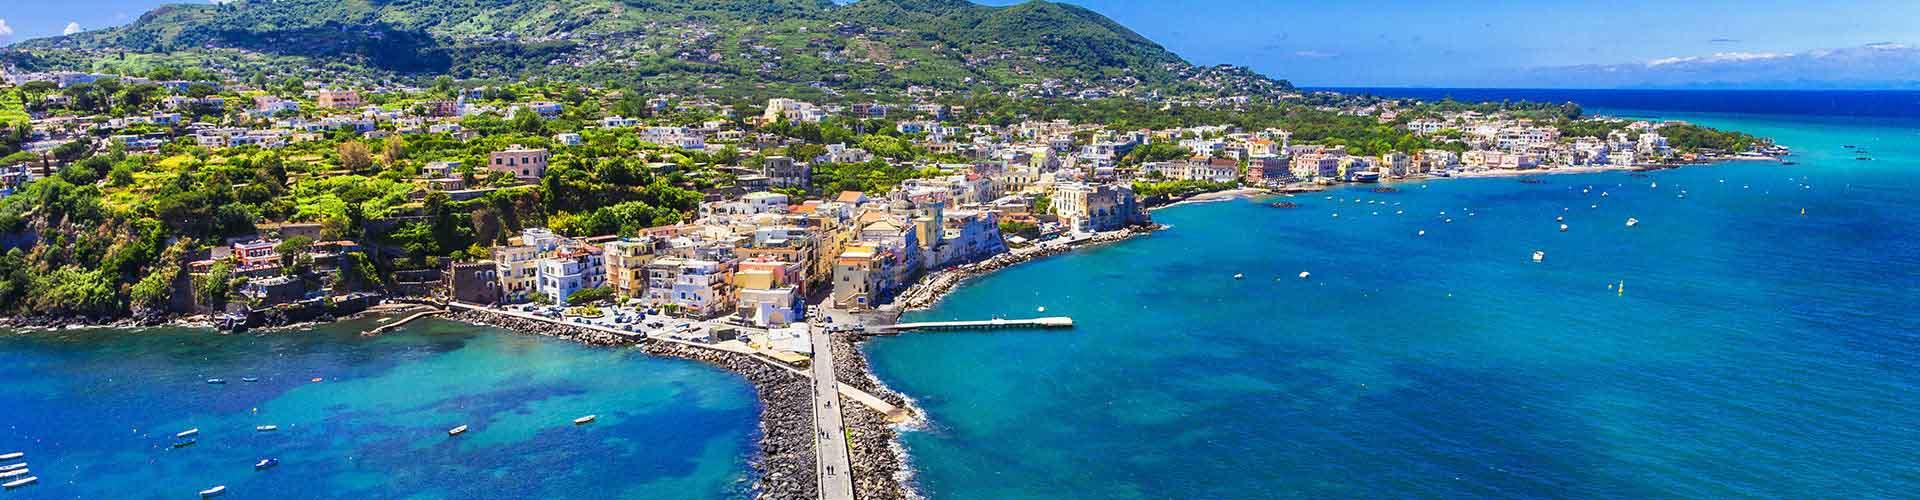 Ischia - Hostales en Ischia. Mapas de Ischia, Fotos y comentarios de cada Hostal en Ischia.